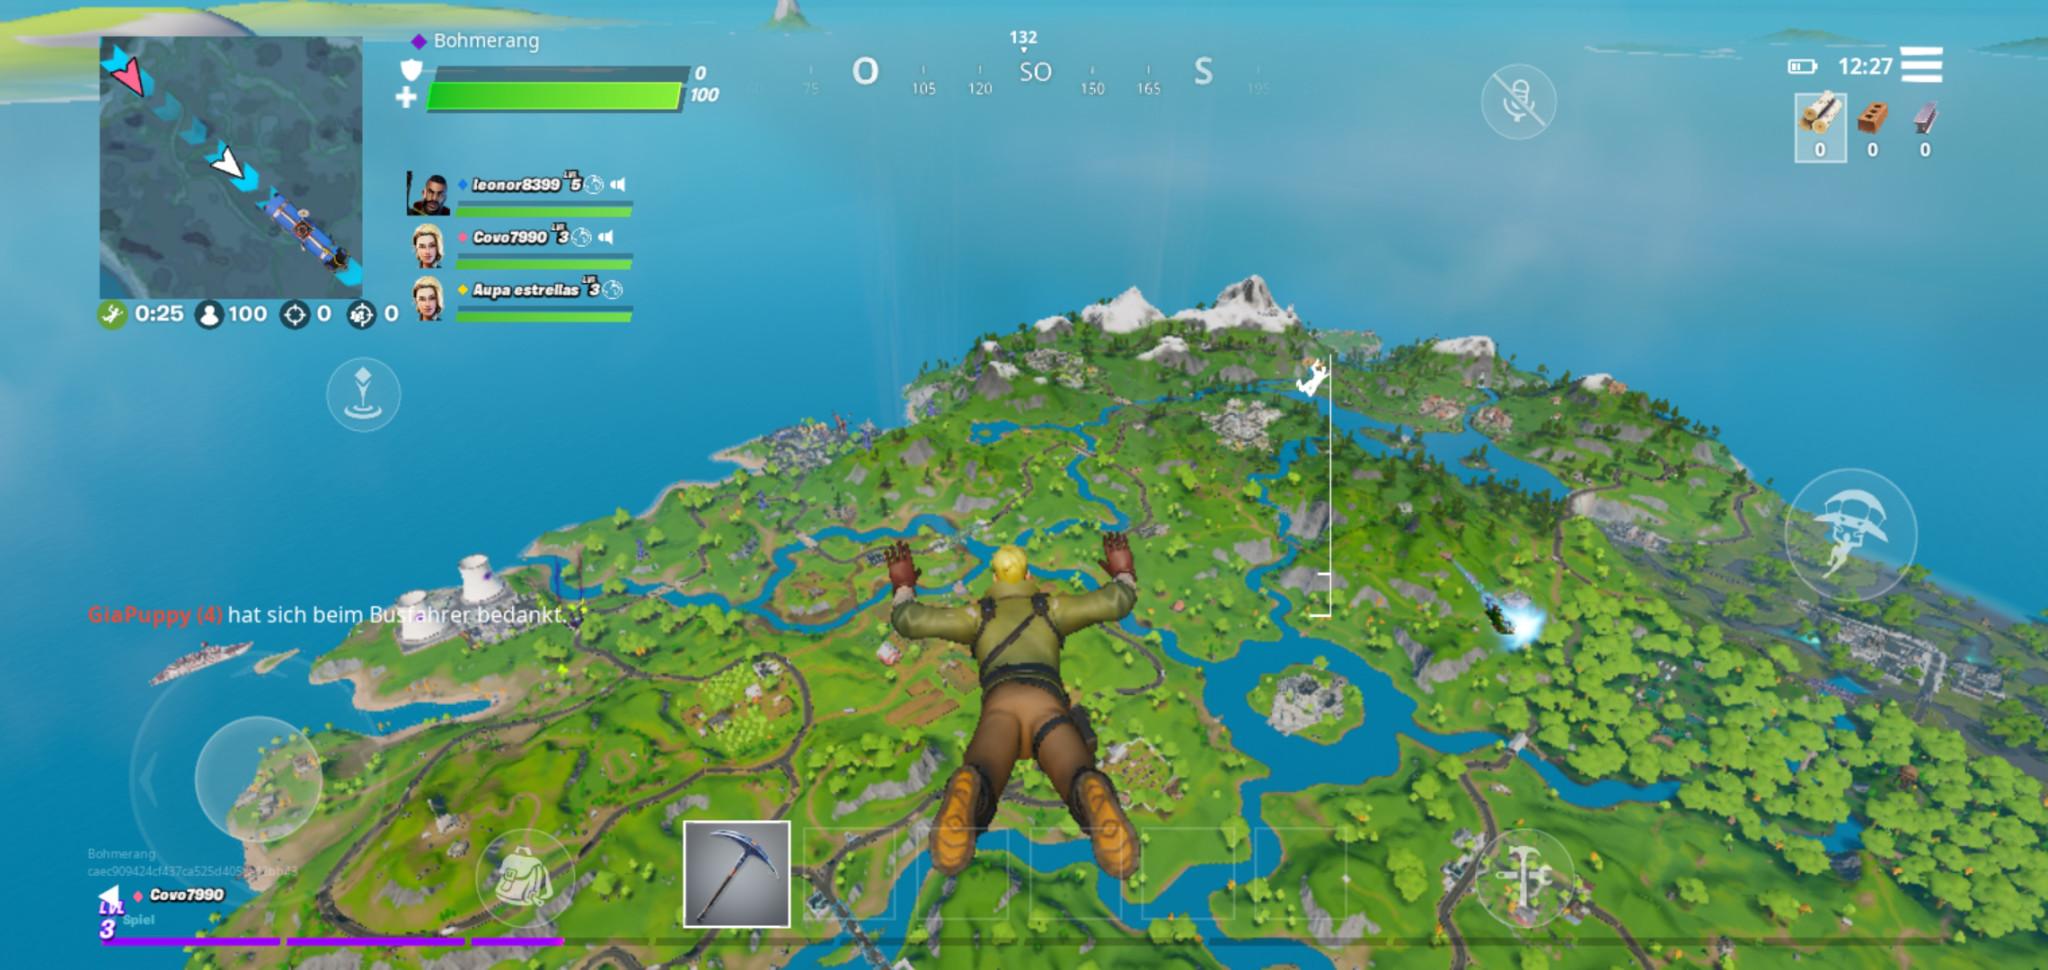 Screenshot 1 - Fortnite: Battle Royale (App für iPhone & iPad)